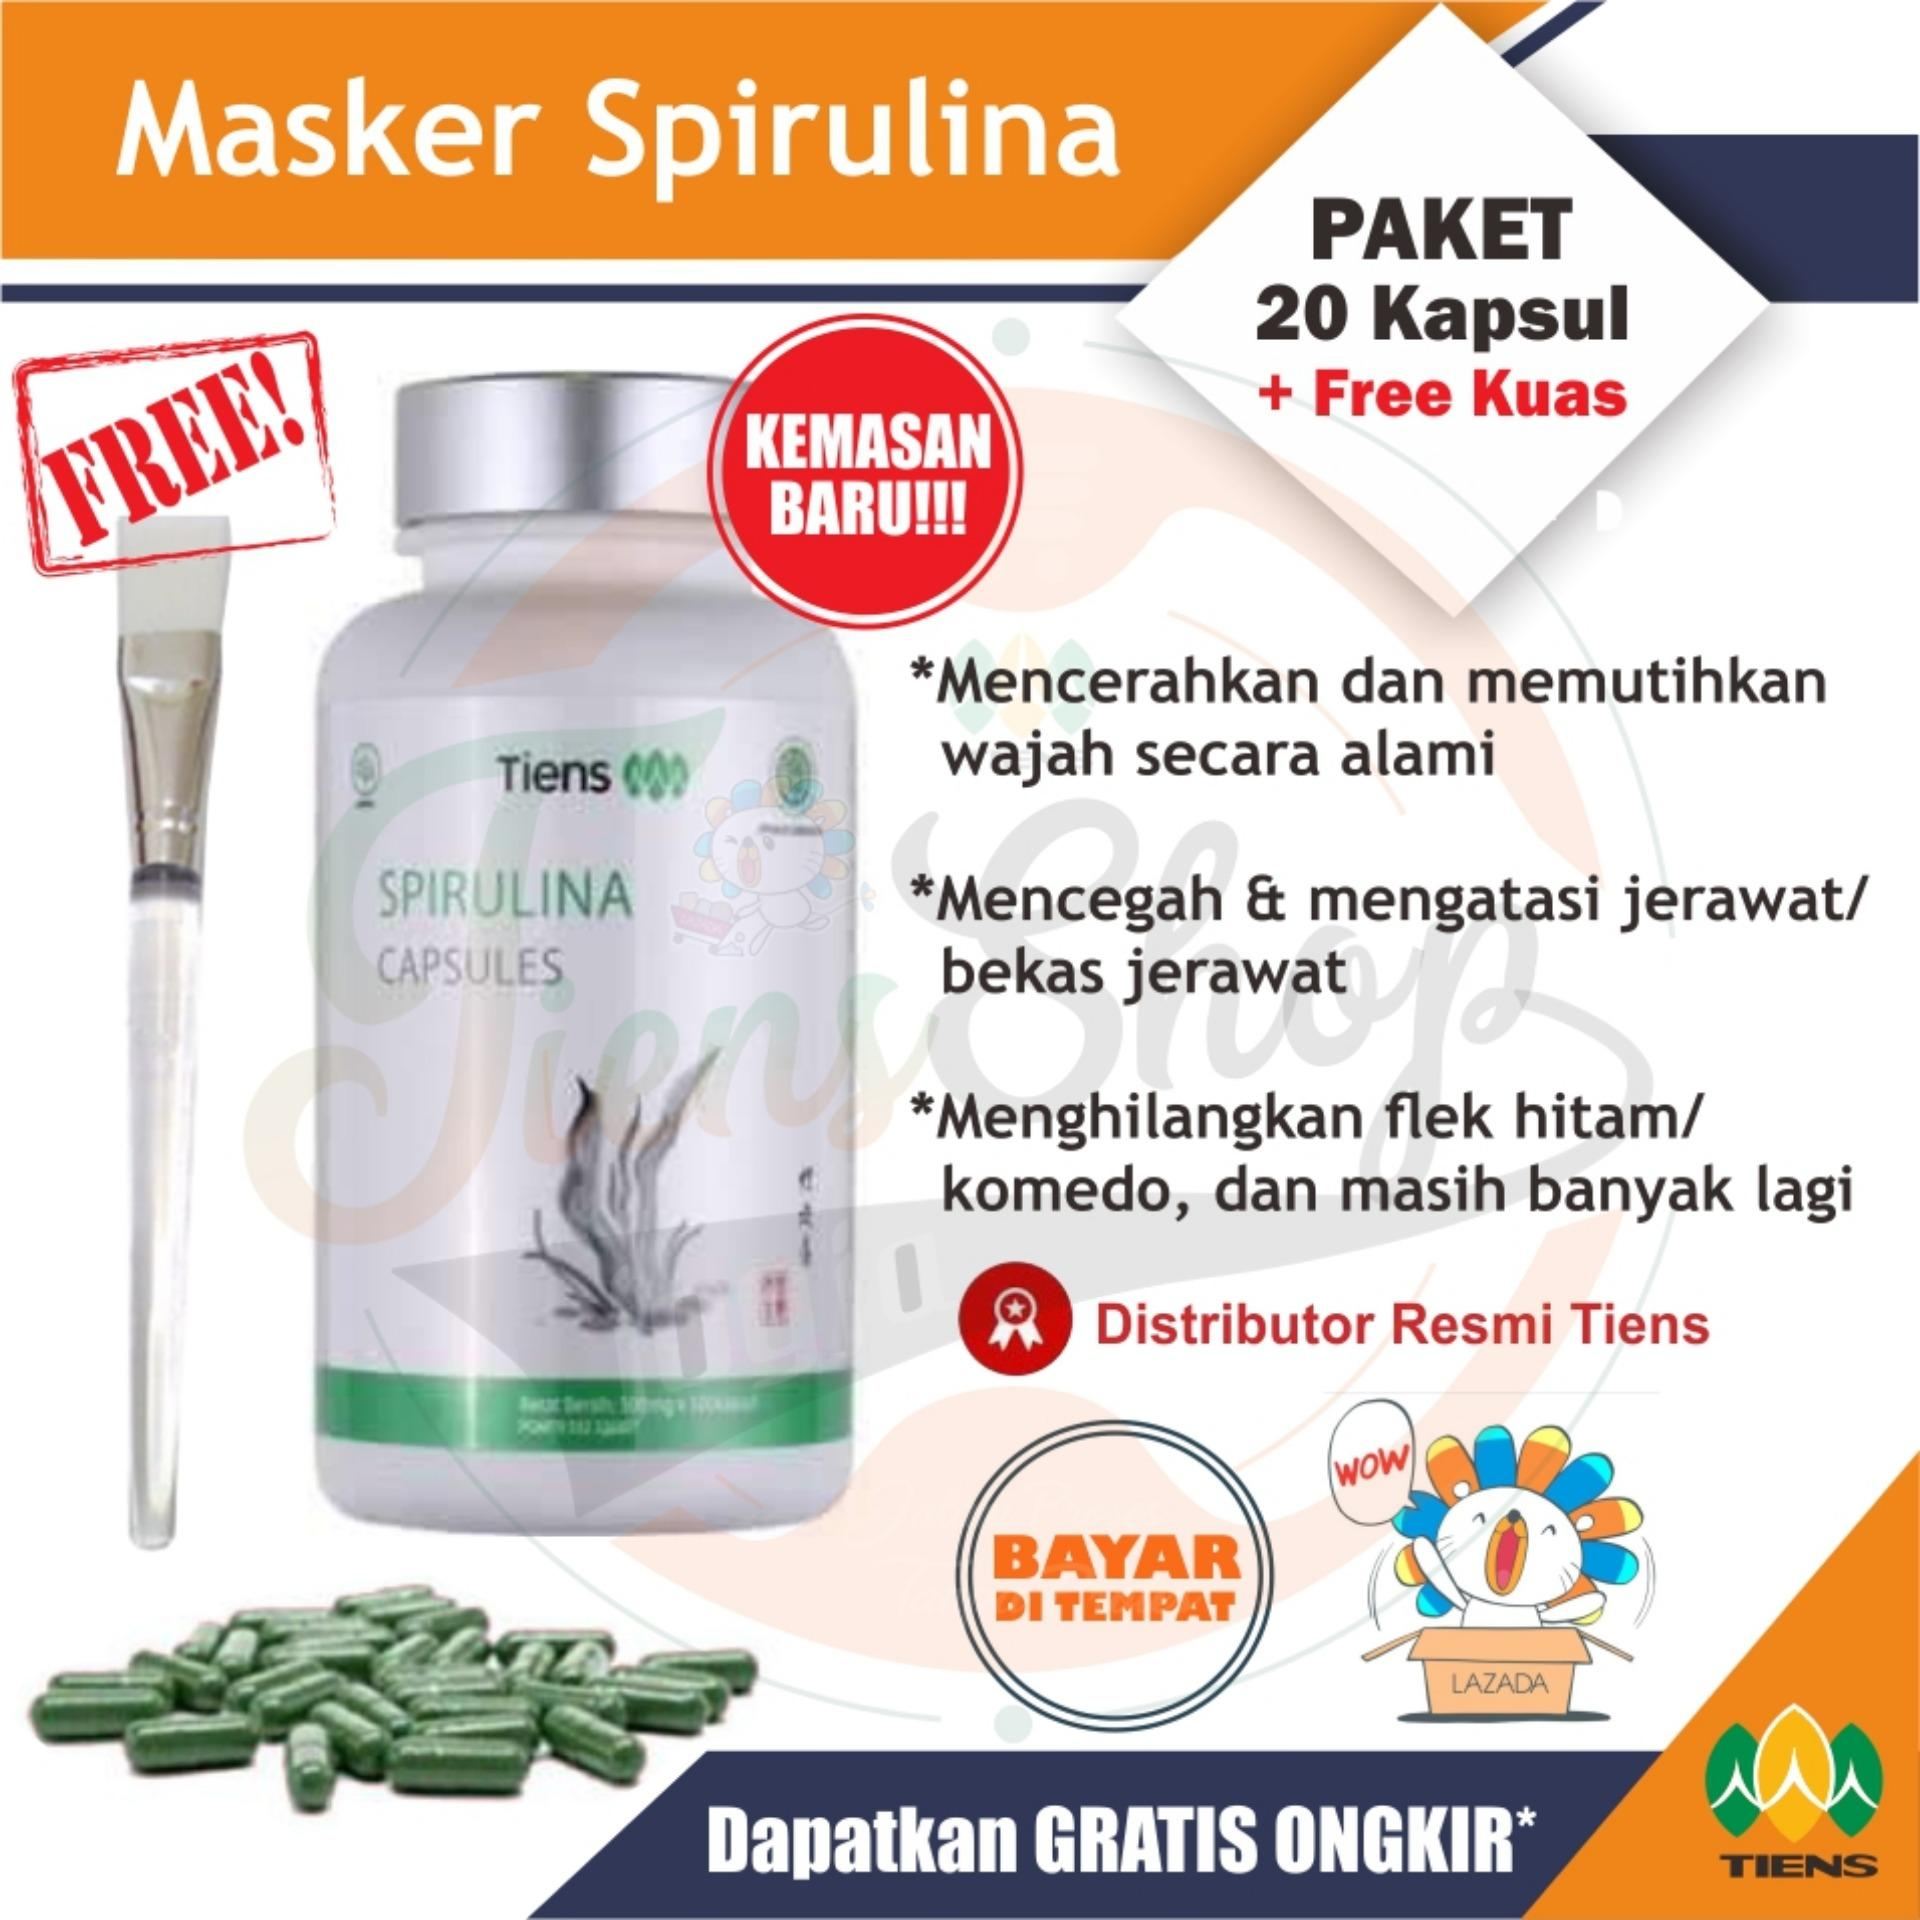 Tiens Masker Spirulina / PAKET 20 Kapsul / Pembersih wajah, Penghilang komedo & Jerawat + GRATIS Kuas Masker Tiens Shop Jogja